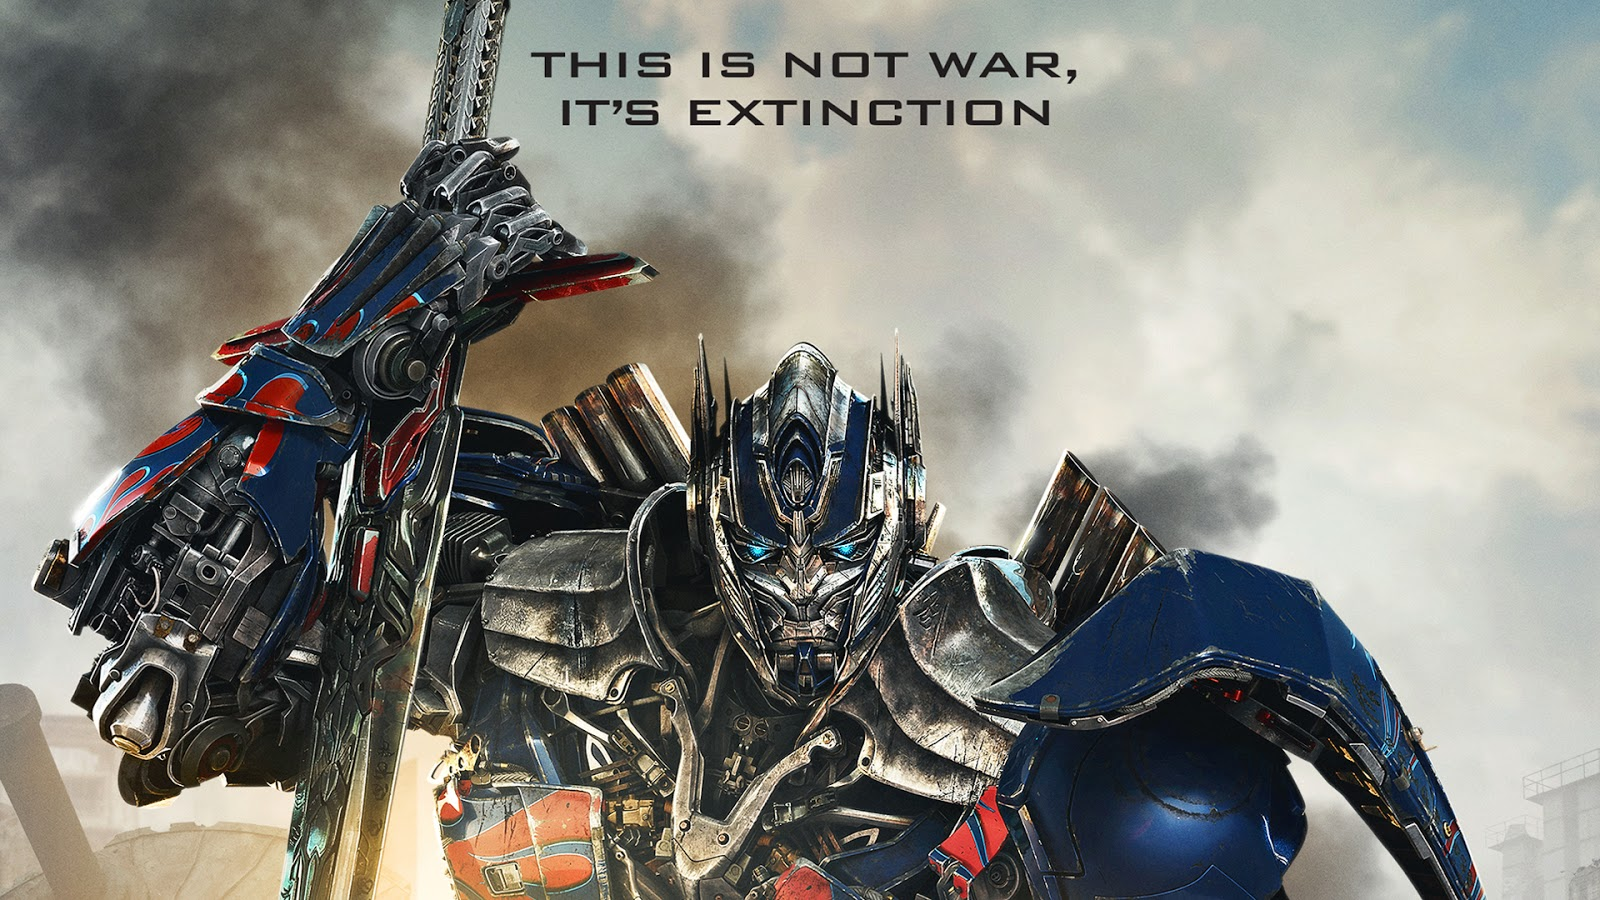 transformers   vincent loy's online journal